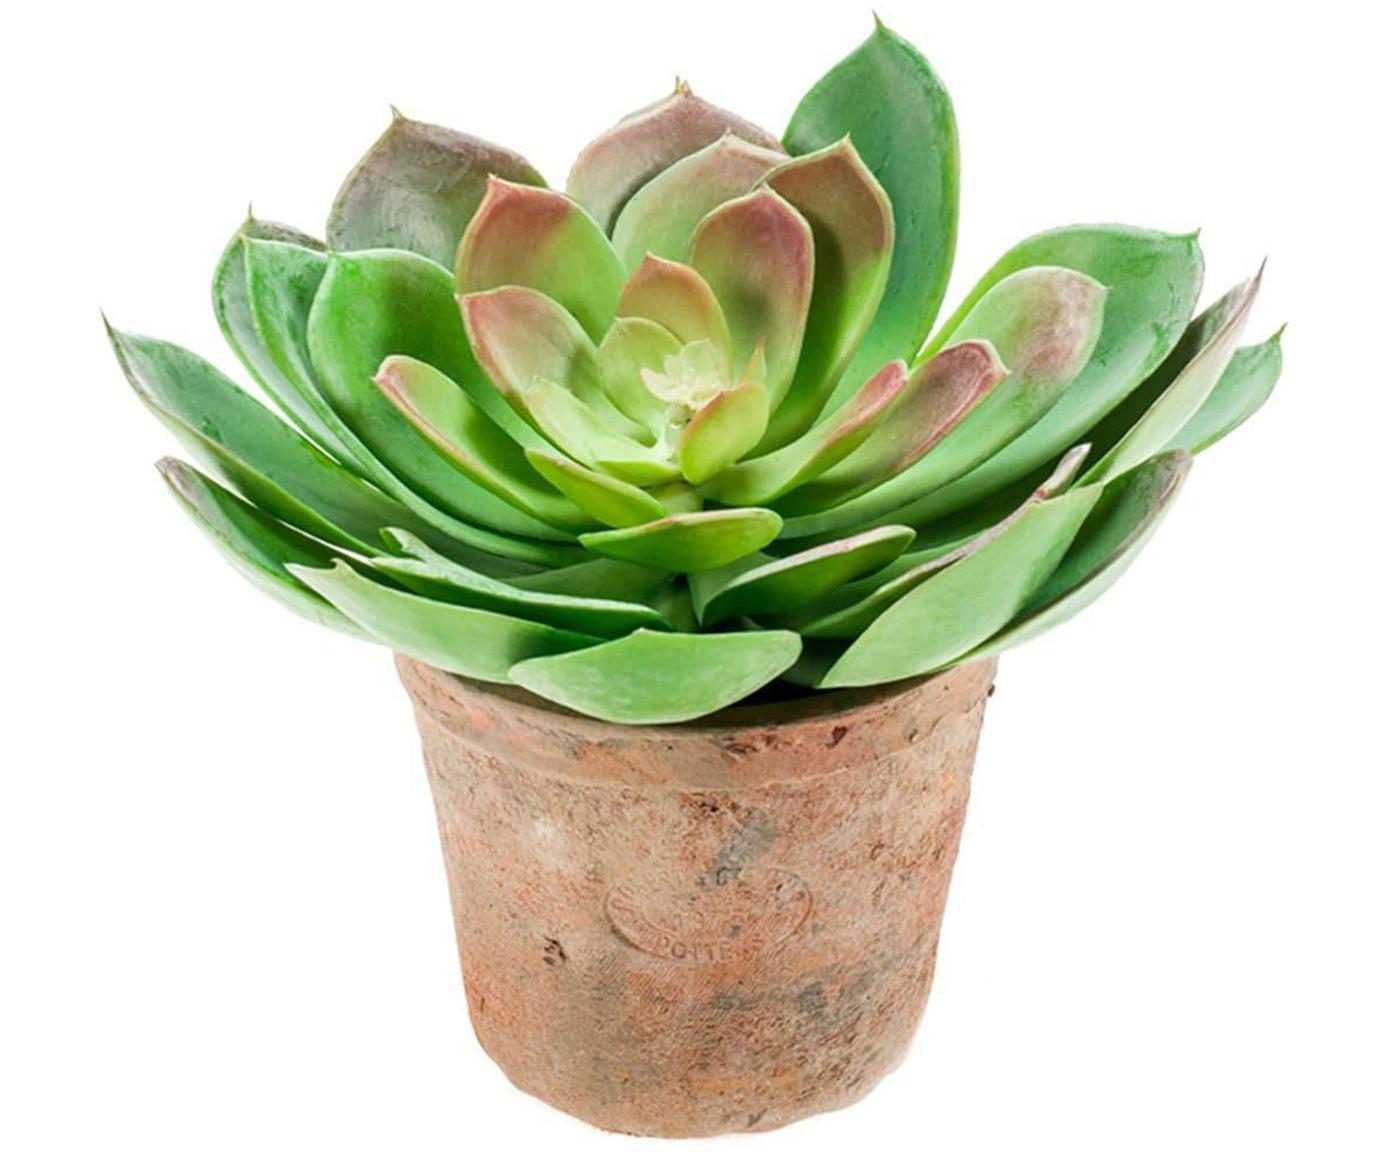 Planta artificial Cactus, Polietileno, Poliuretano, Verde, malva, Ø 15 x Al 20 cm